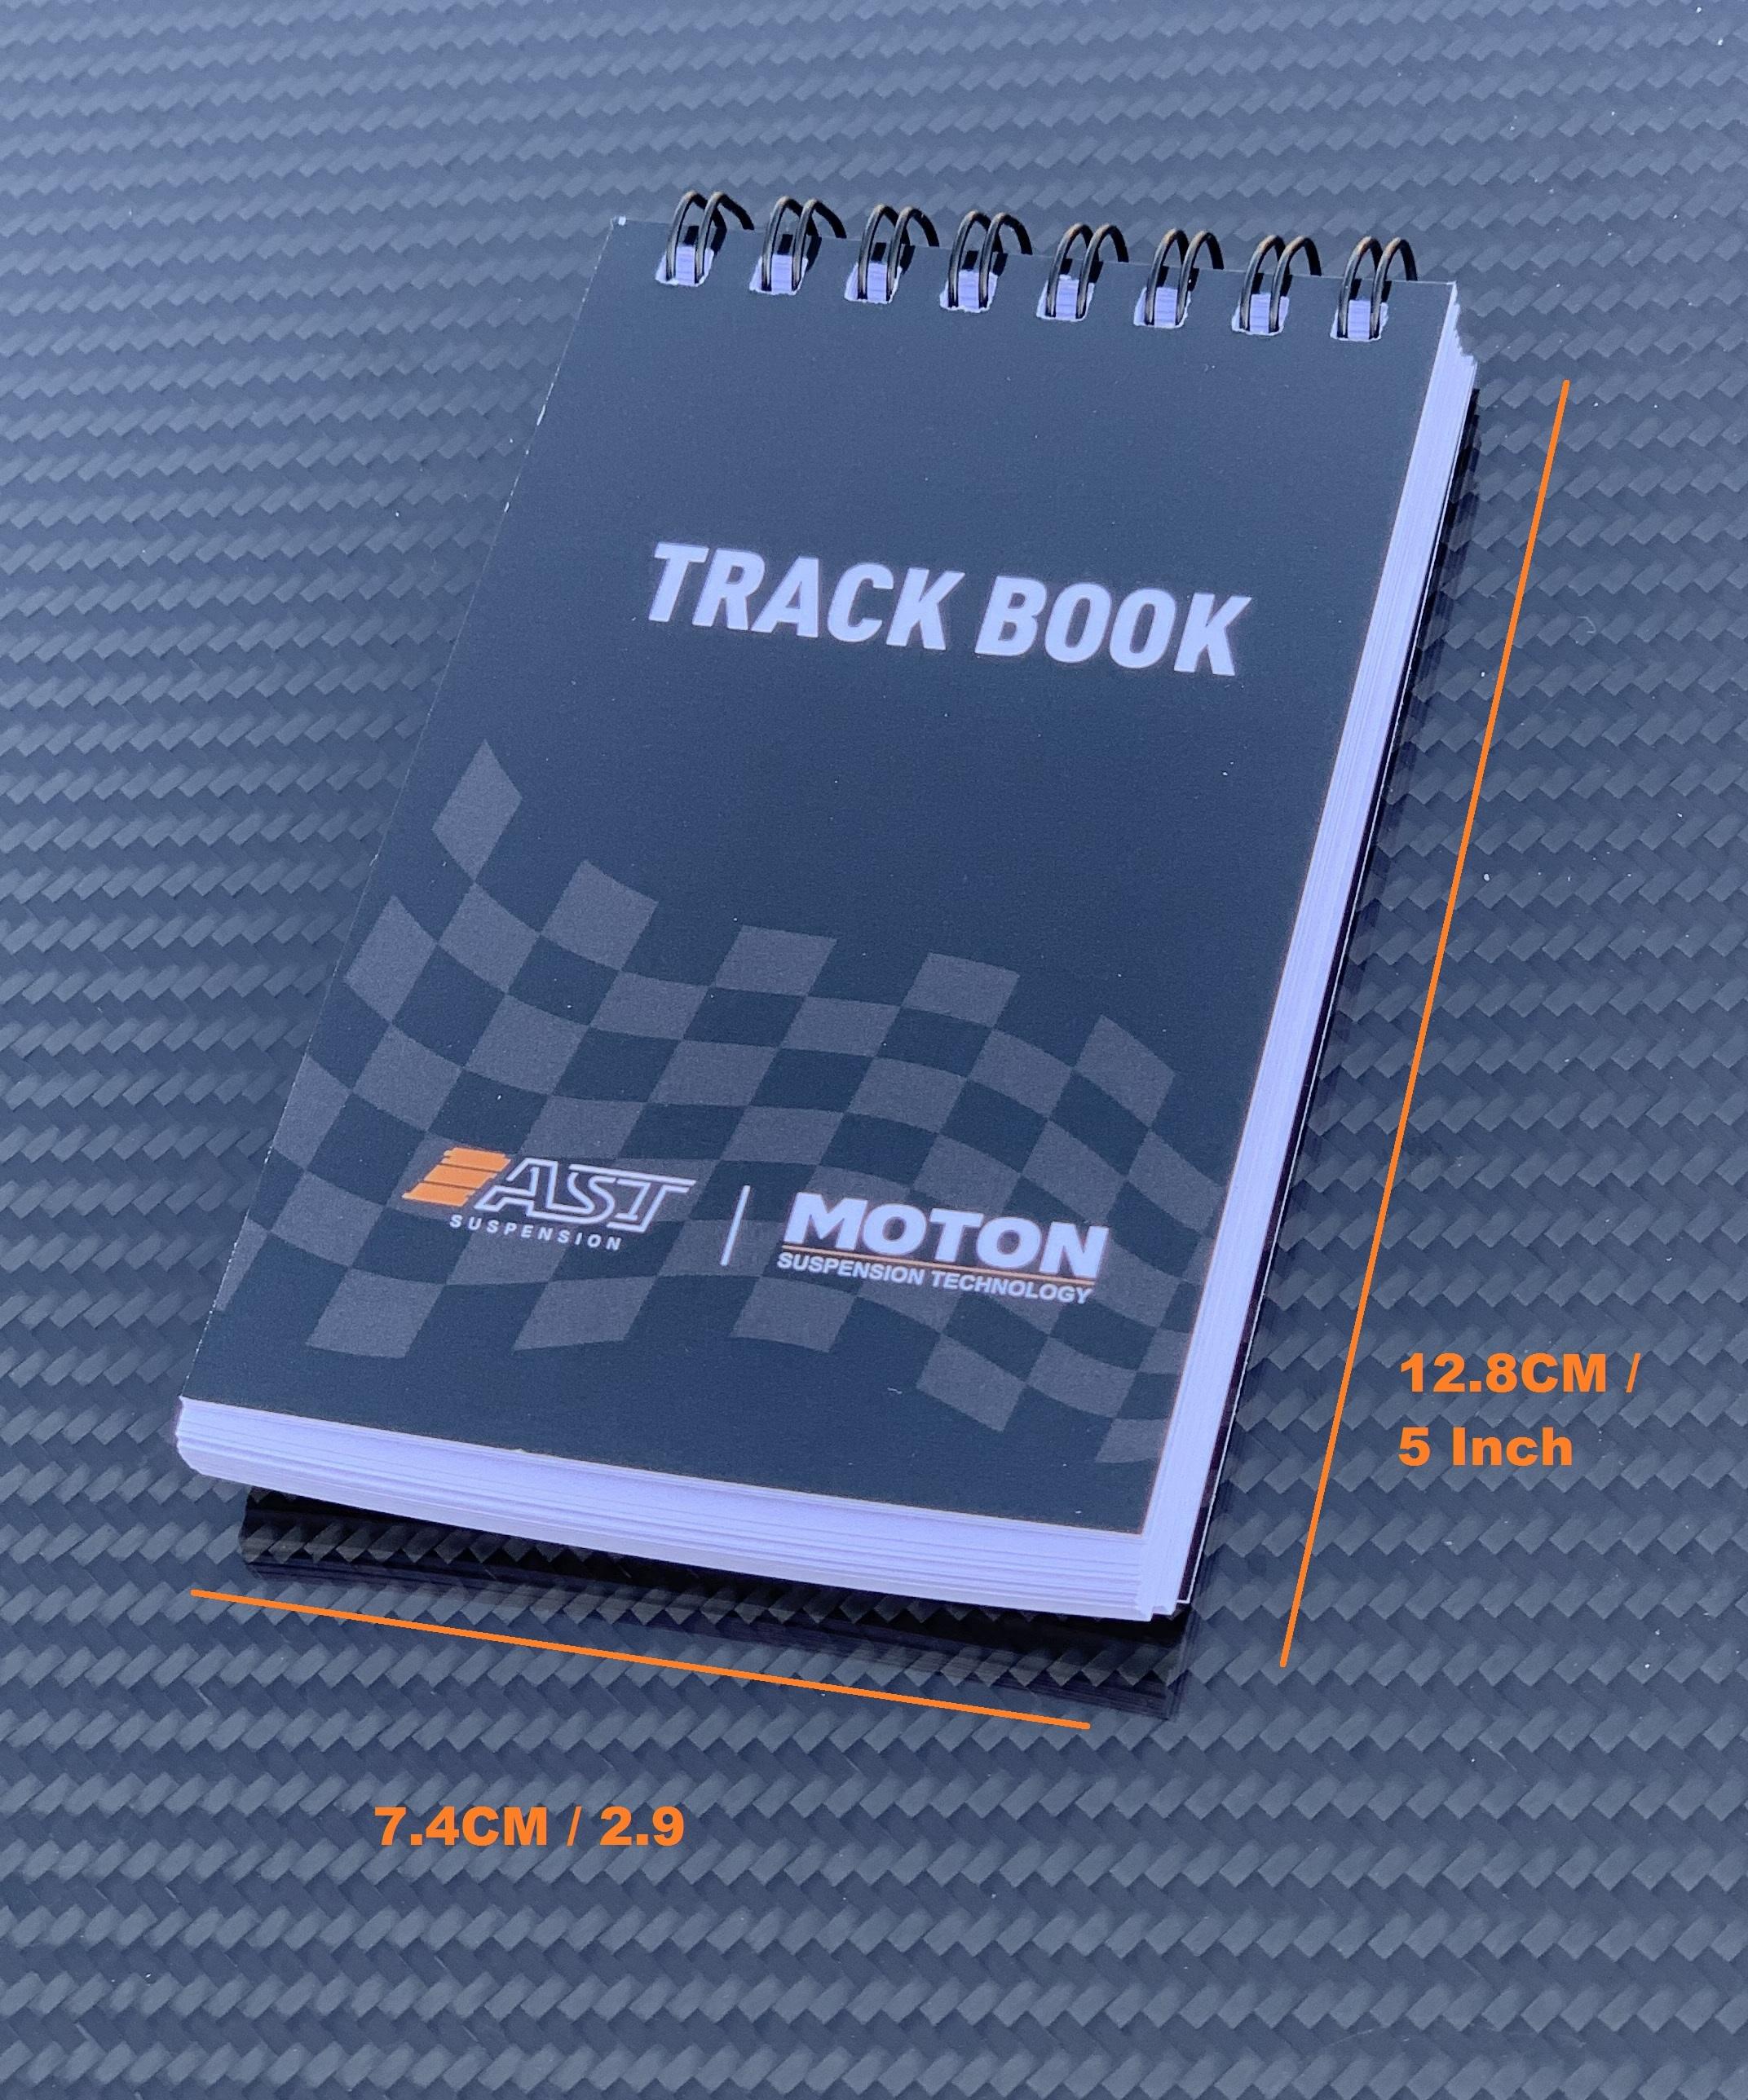 Trackbook AST and MOTON suspension